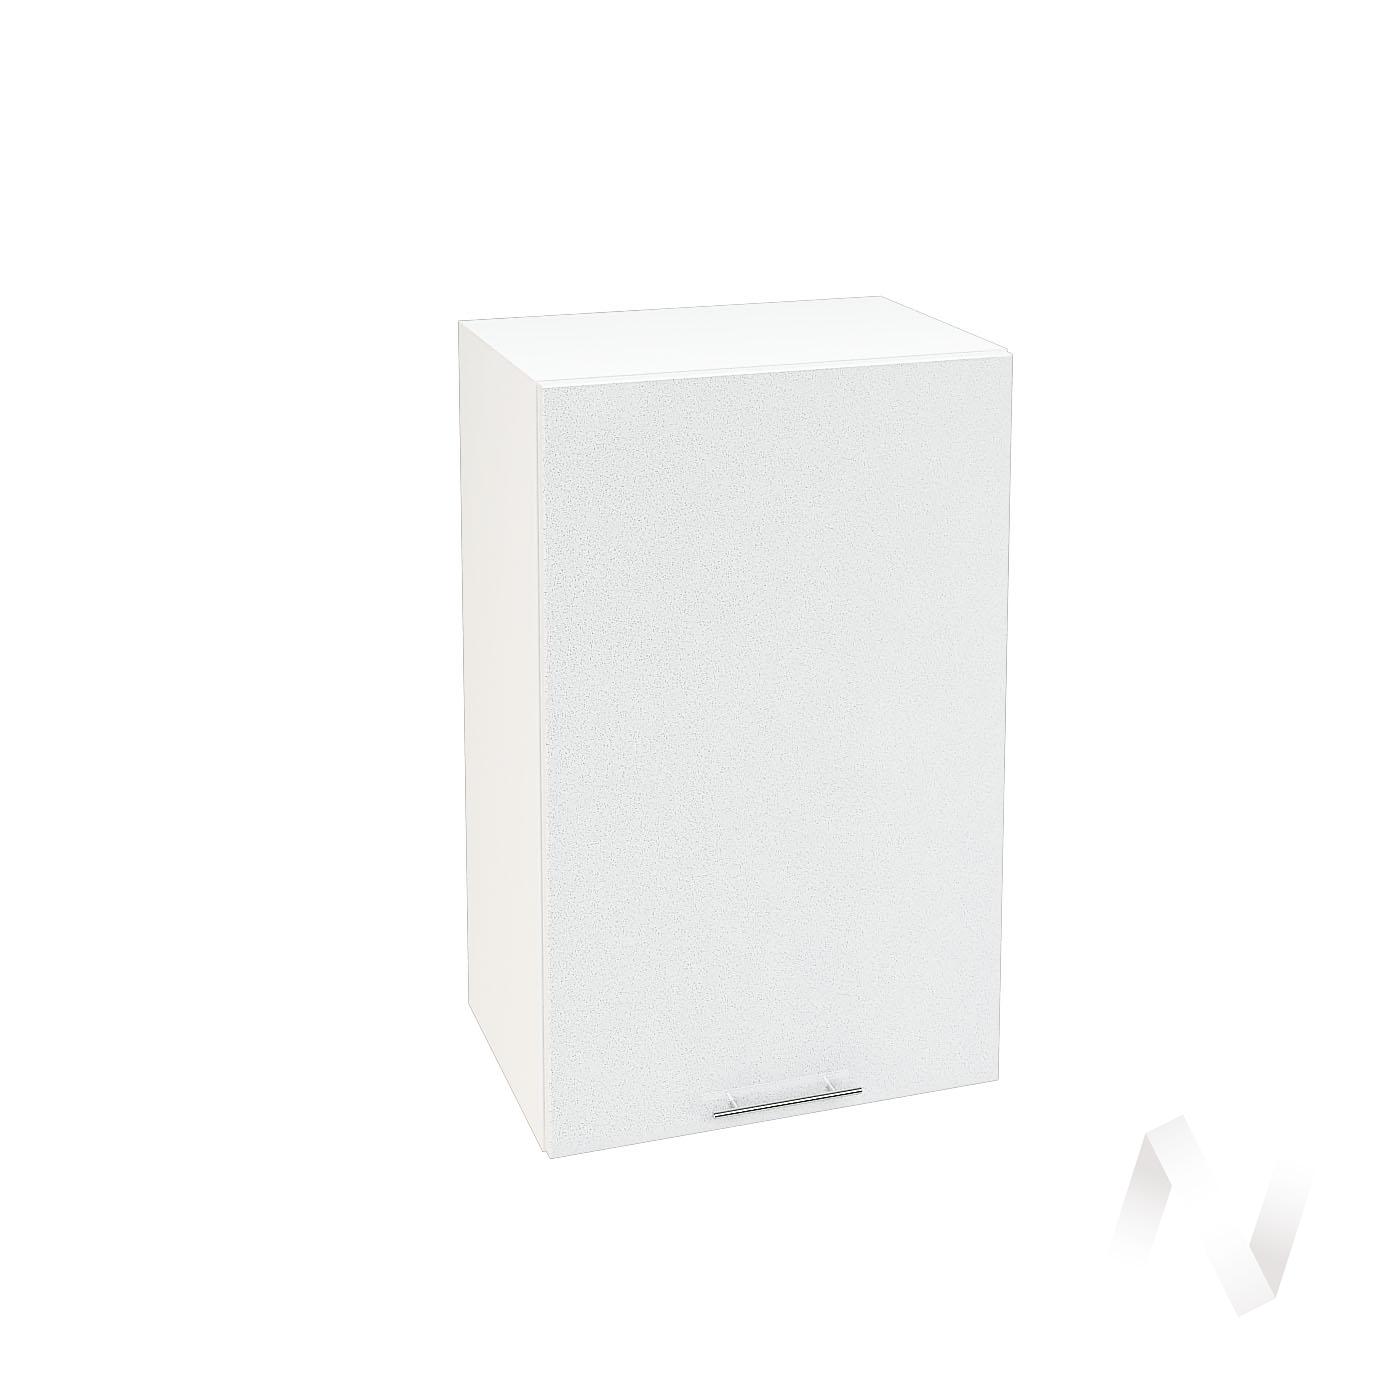 "Кухня ""Валерия-М"": Шкаф верхний 450, ШВ 450 (белый металлик/корпус белый)"